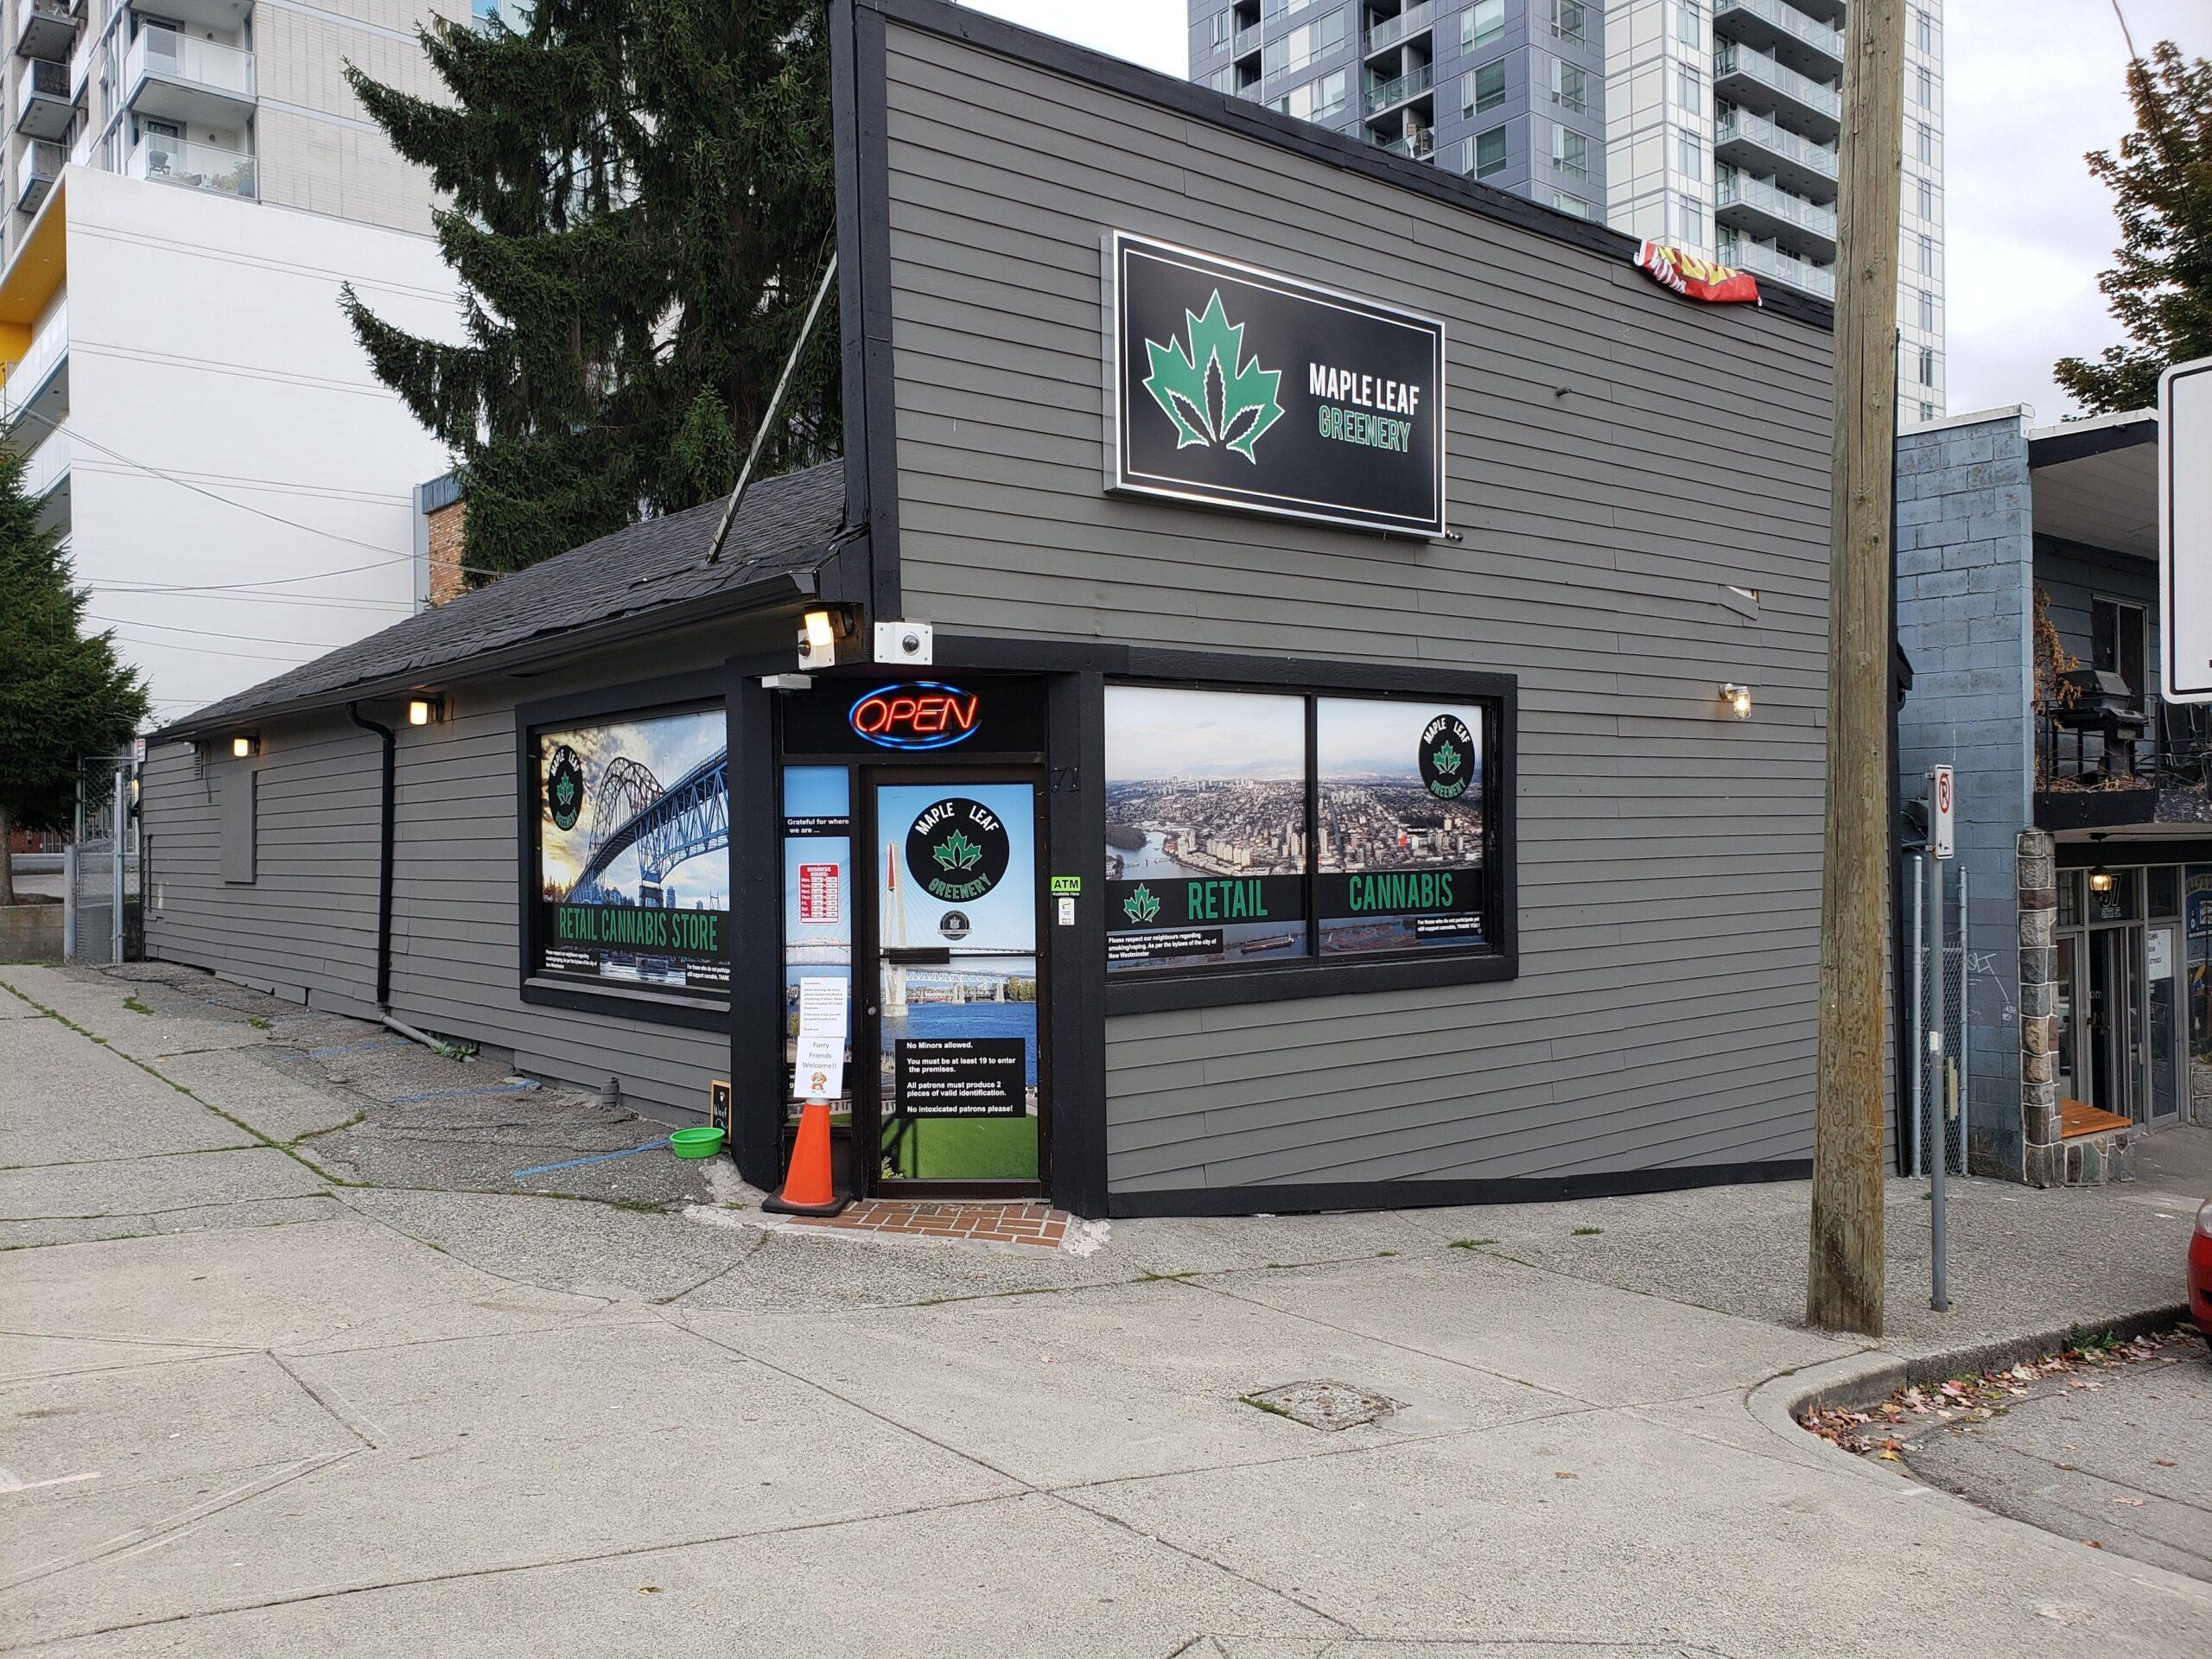 Maple Leaf Greenery Ltd.